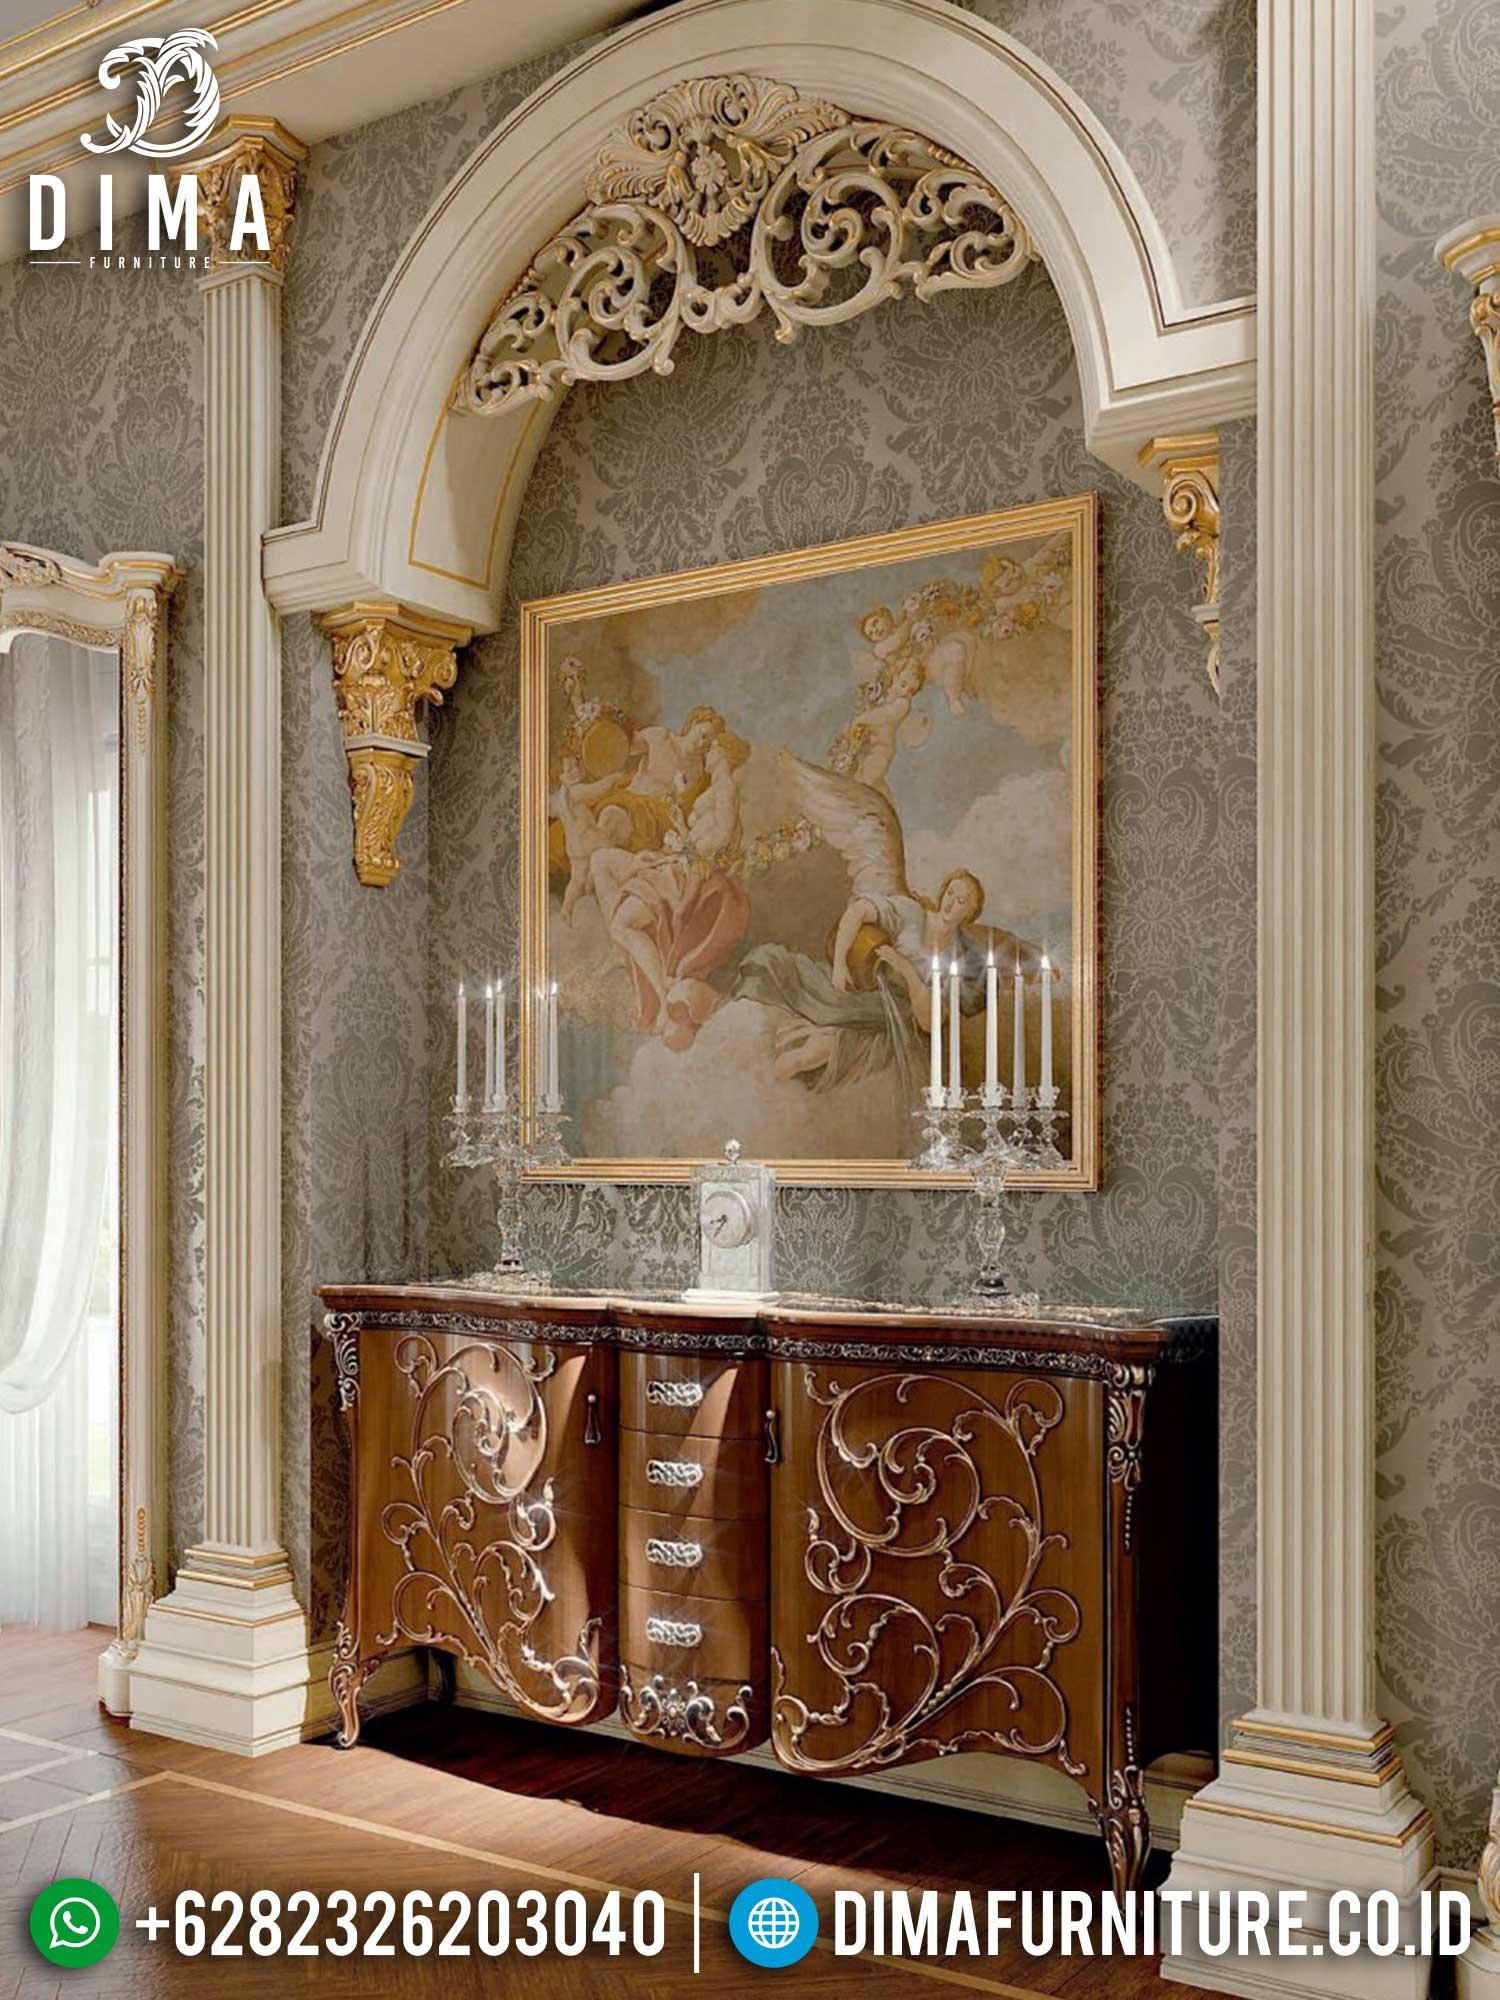 New Meja Konsul Mewah Kayu Jati Natural Classic Furniture Jepara Terupdate TTJ-1466